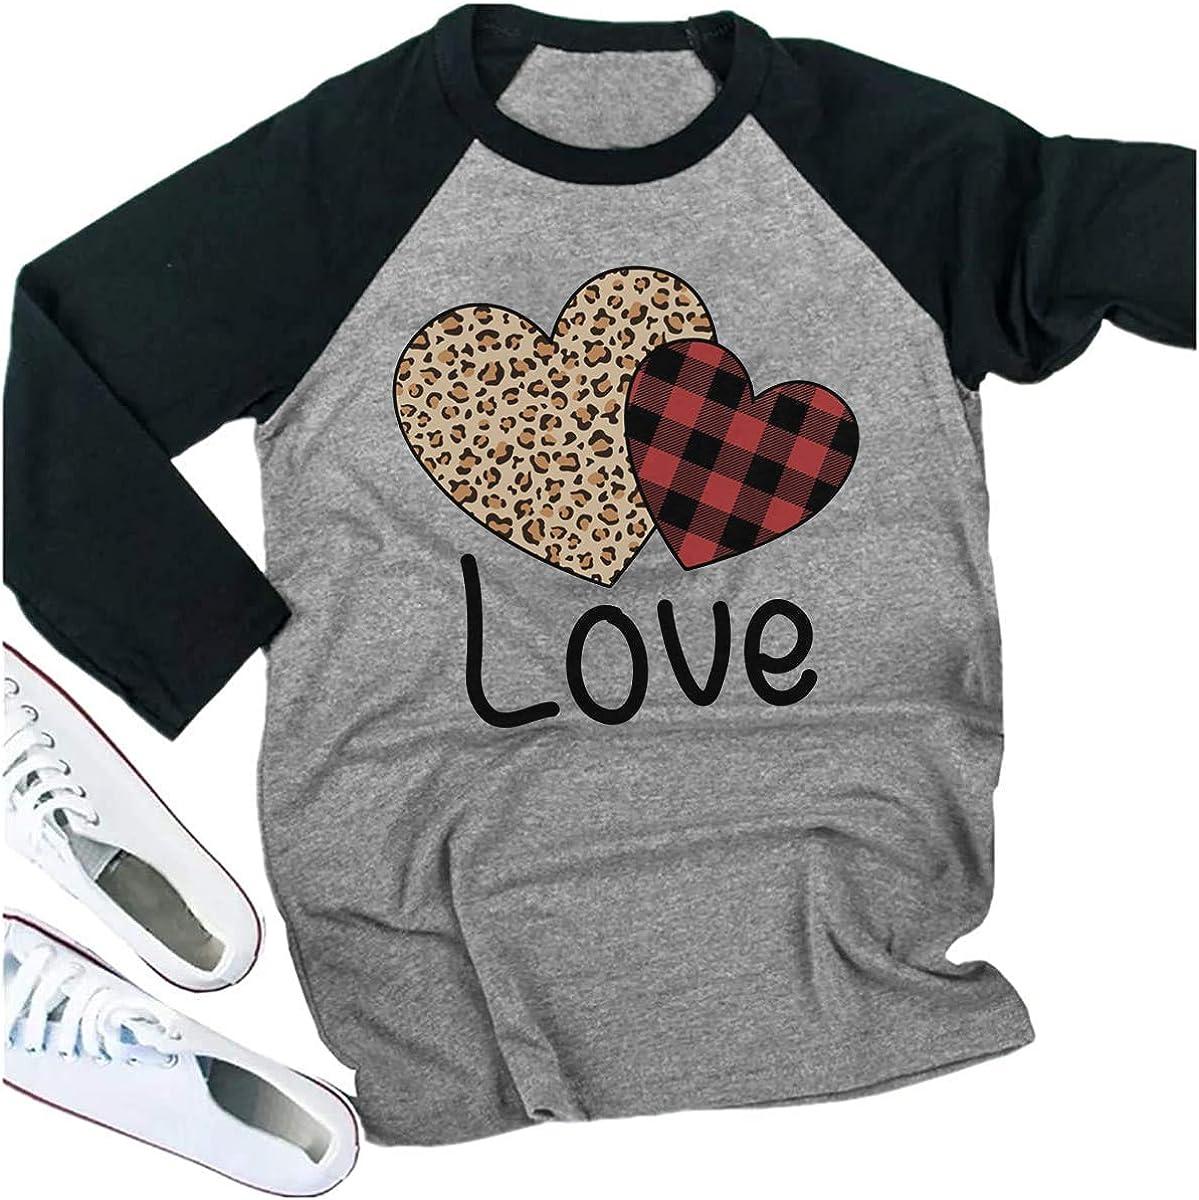 Valentines Day Shirts for Women Love Heart Tshirt 3//4 Raglan Sleeve Valentine Tops Clothes